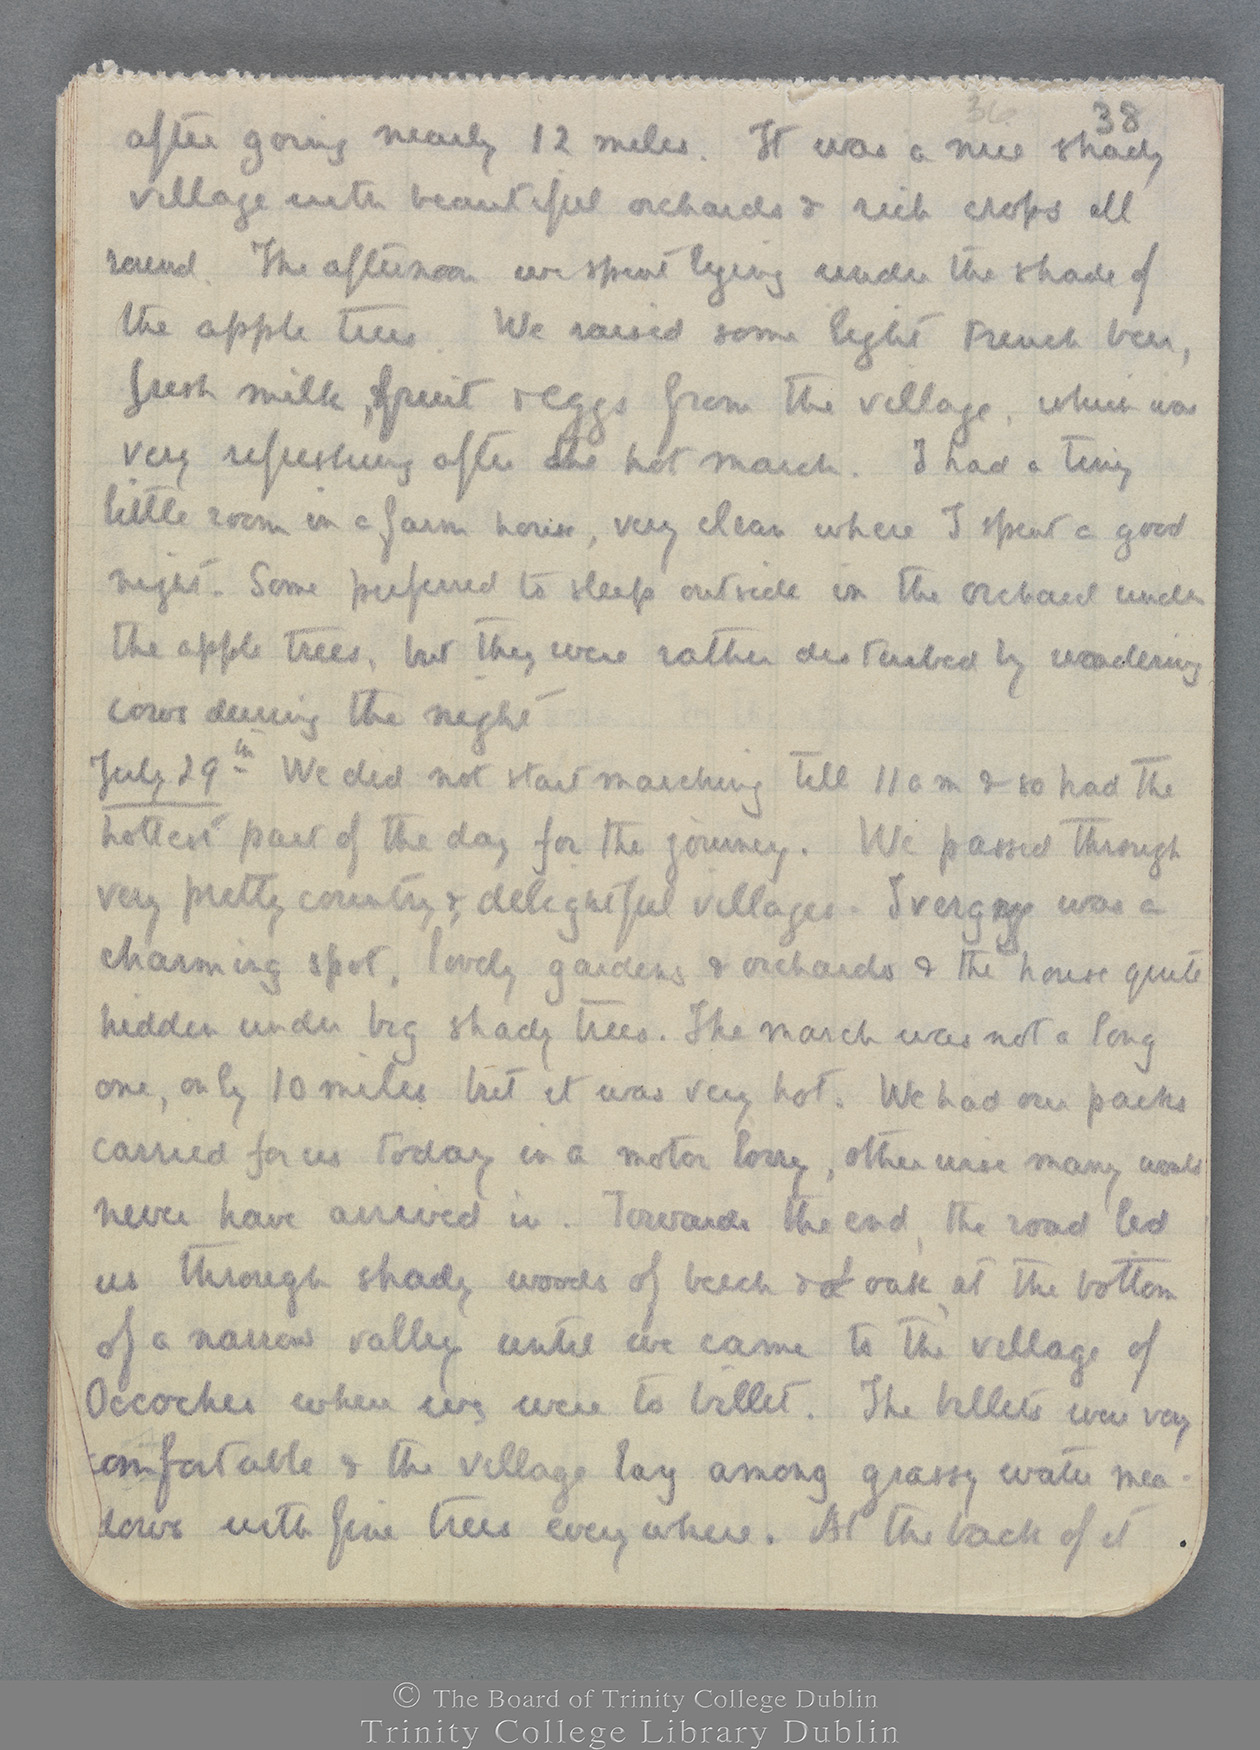 TCD MS 10821 folio 38 recto